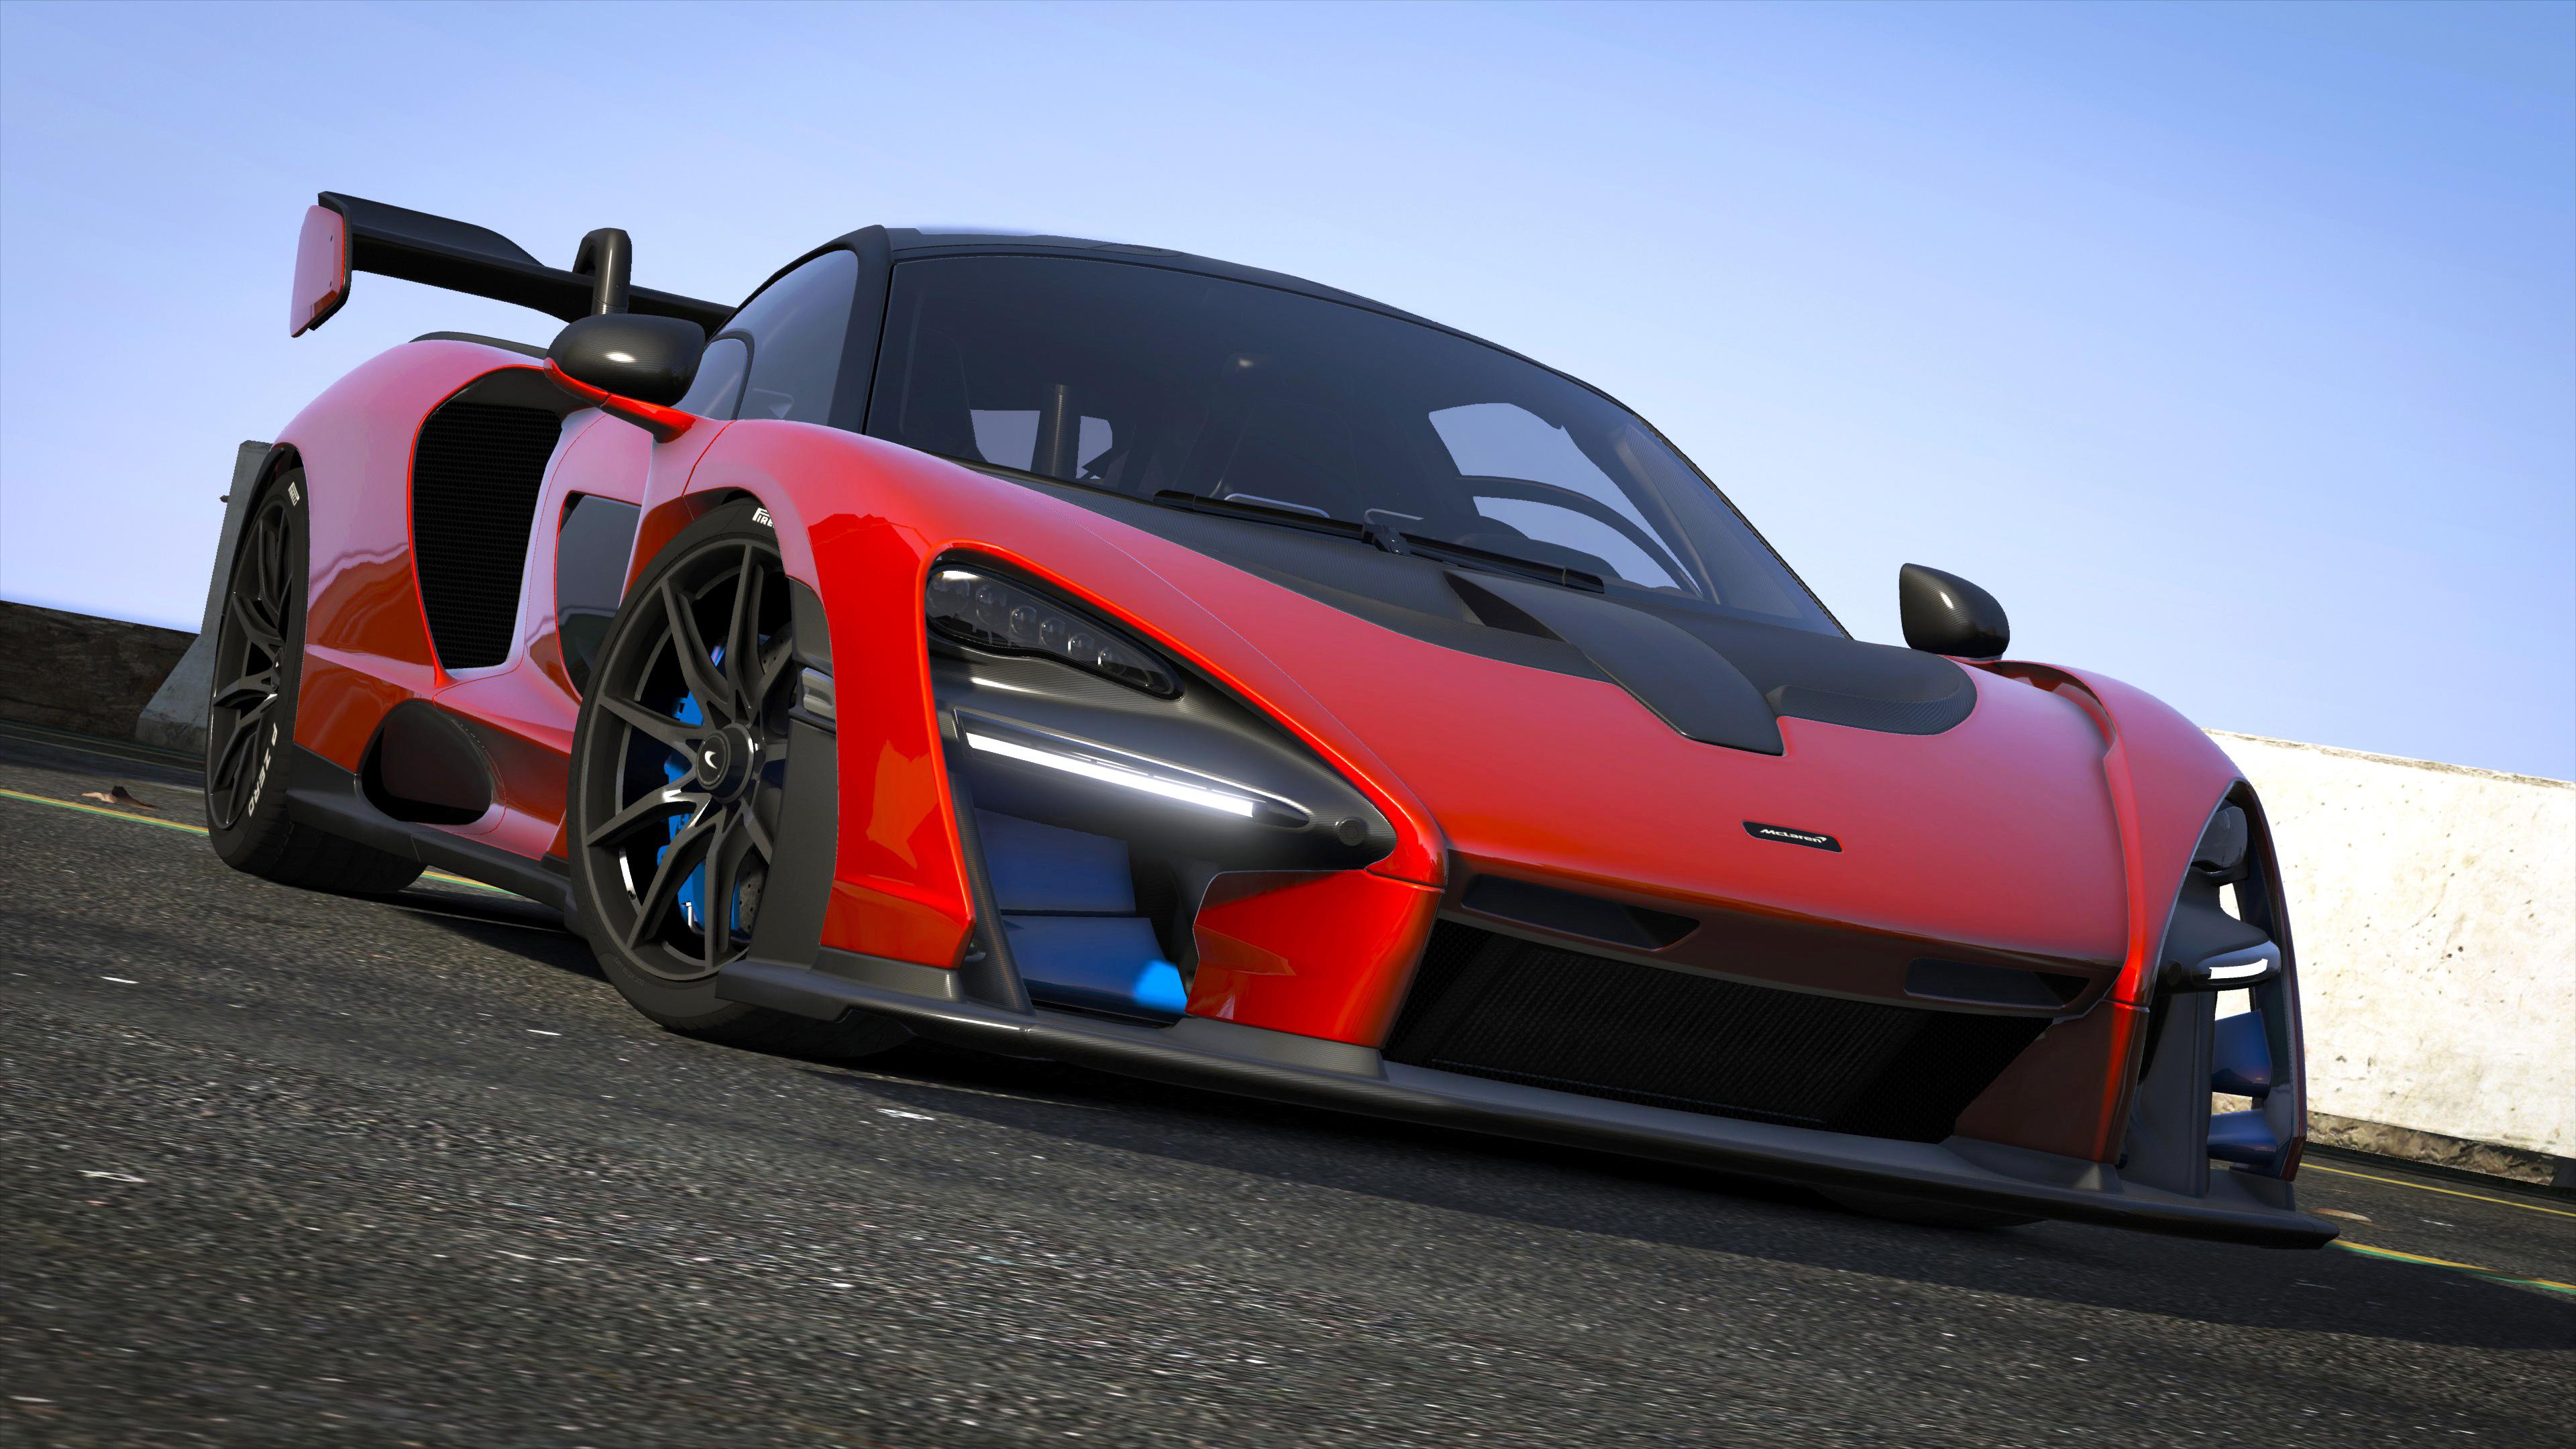 2019 McLaren Senna [Add-On] - GTA5-Mods com